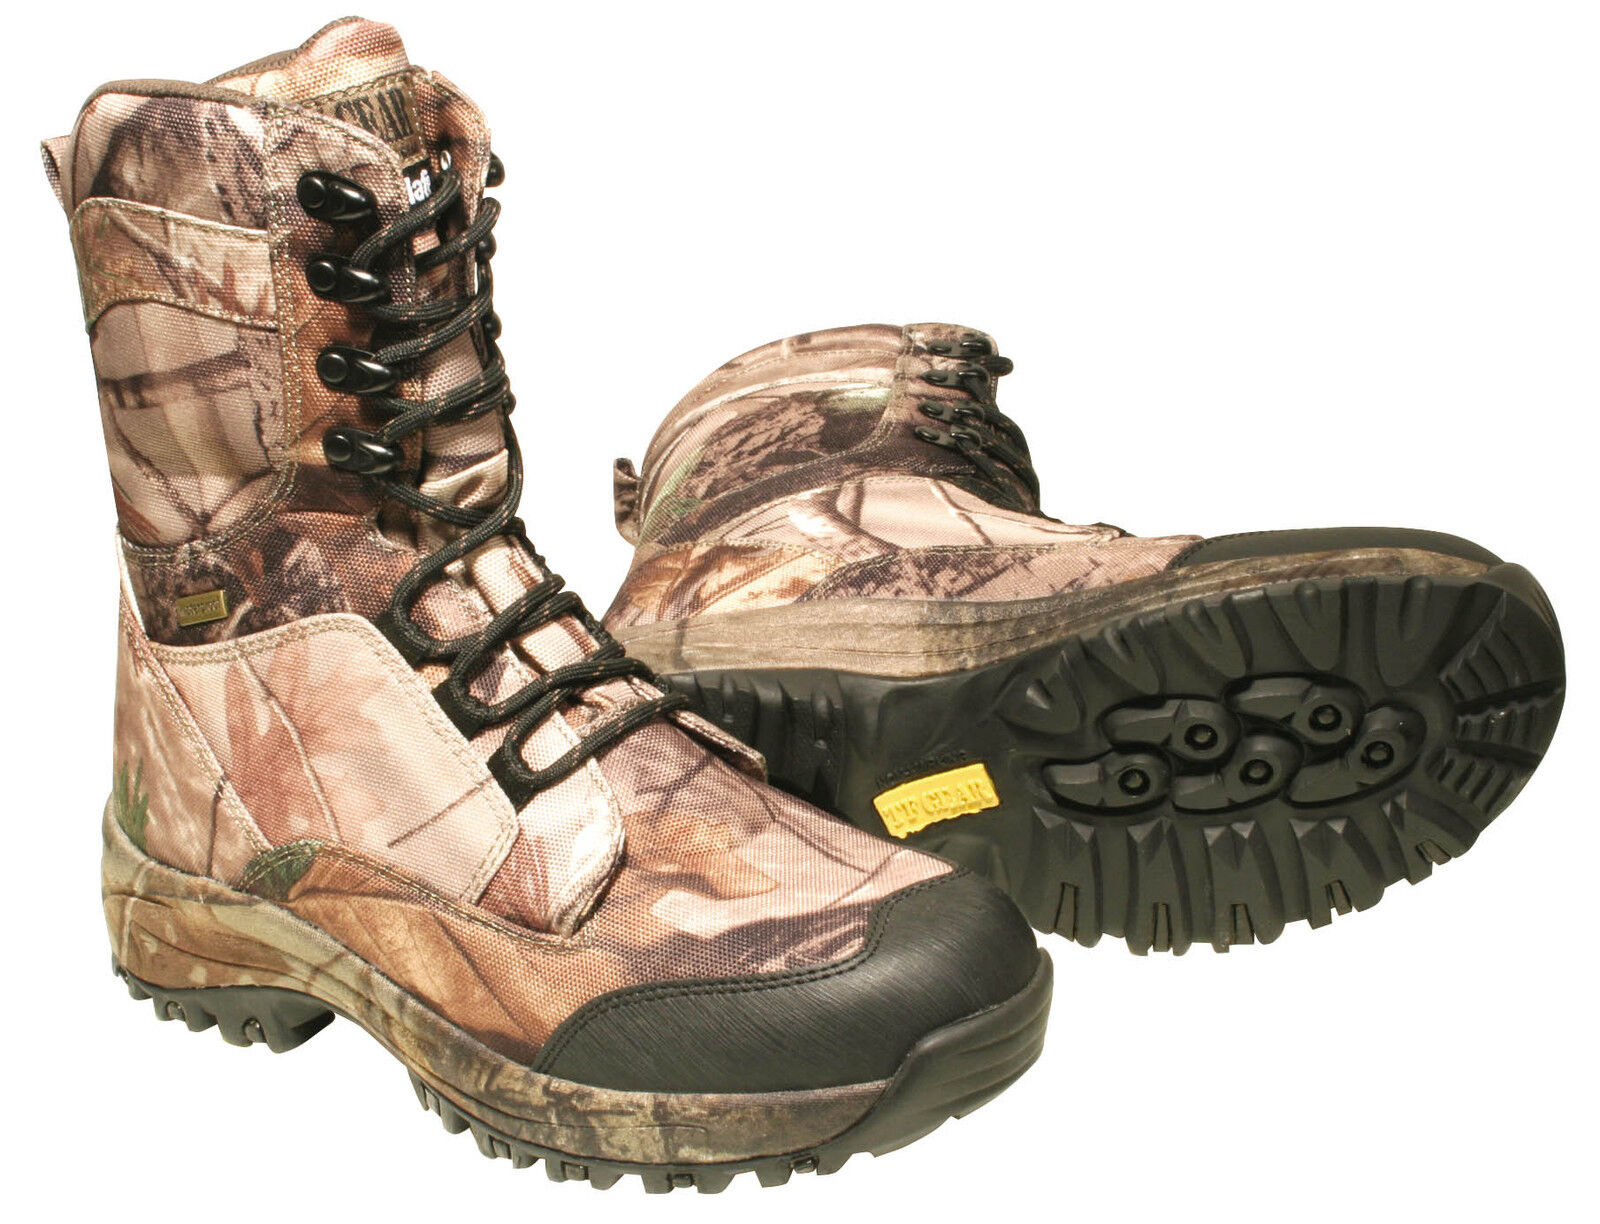 TF Gear Primal Camo Stiefel Stiefel Stiefel Gr. 45 Anglerschuhe Winterschuhe Outdoorschuhe Stiefel 5e88b3